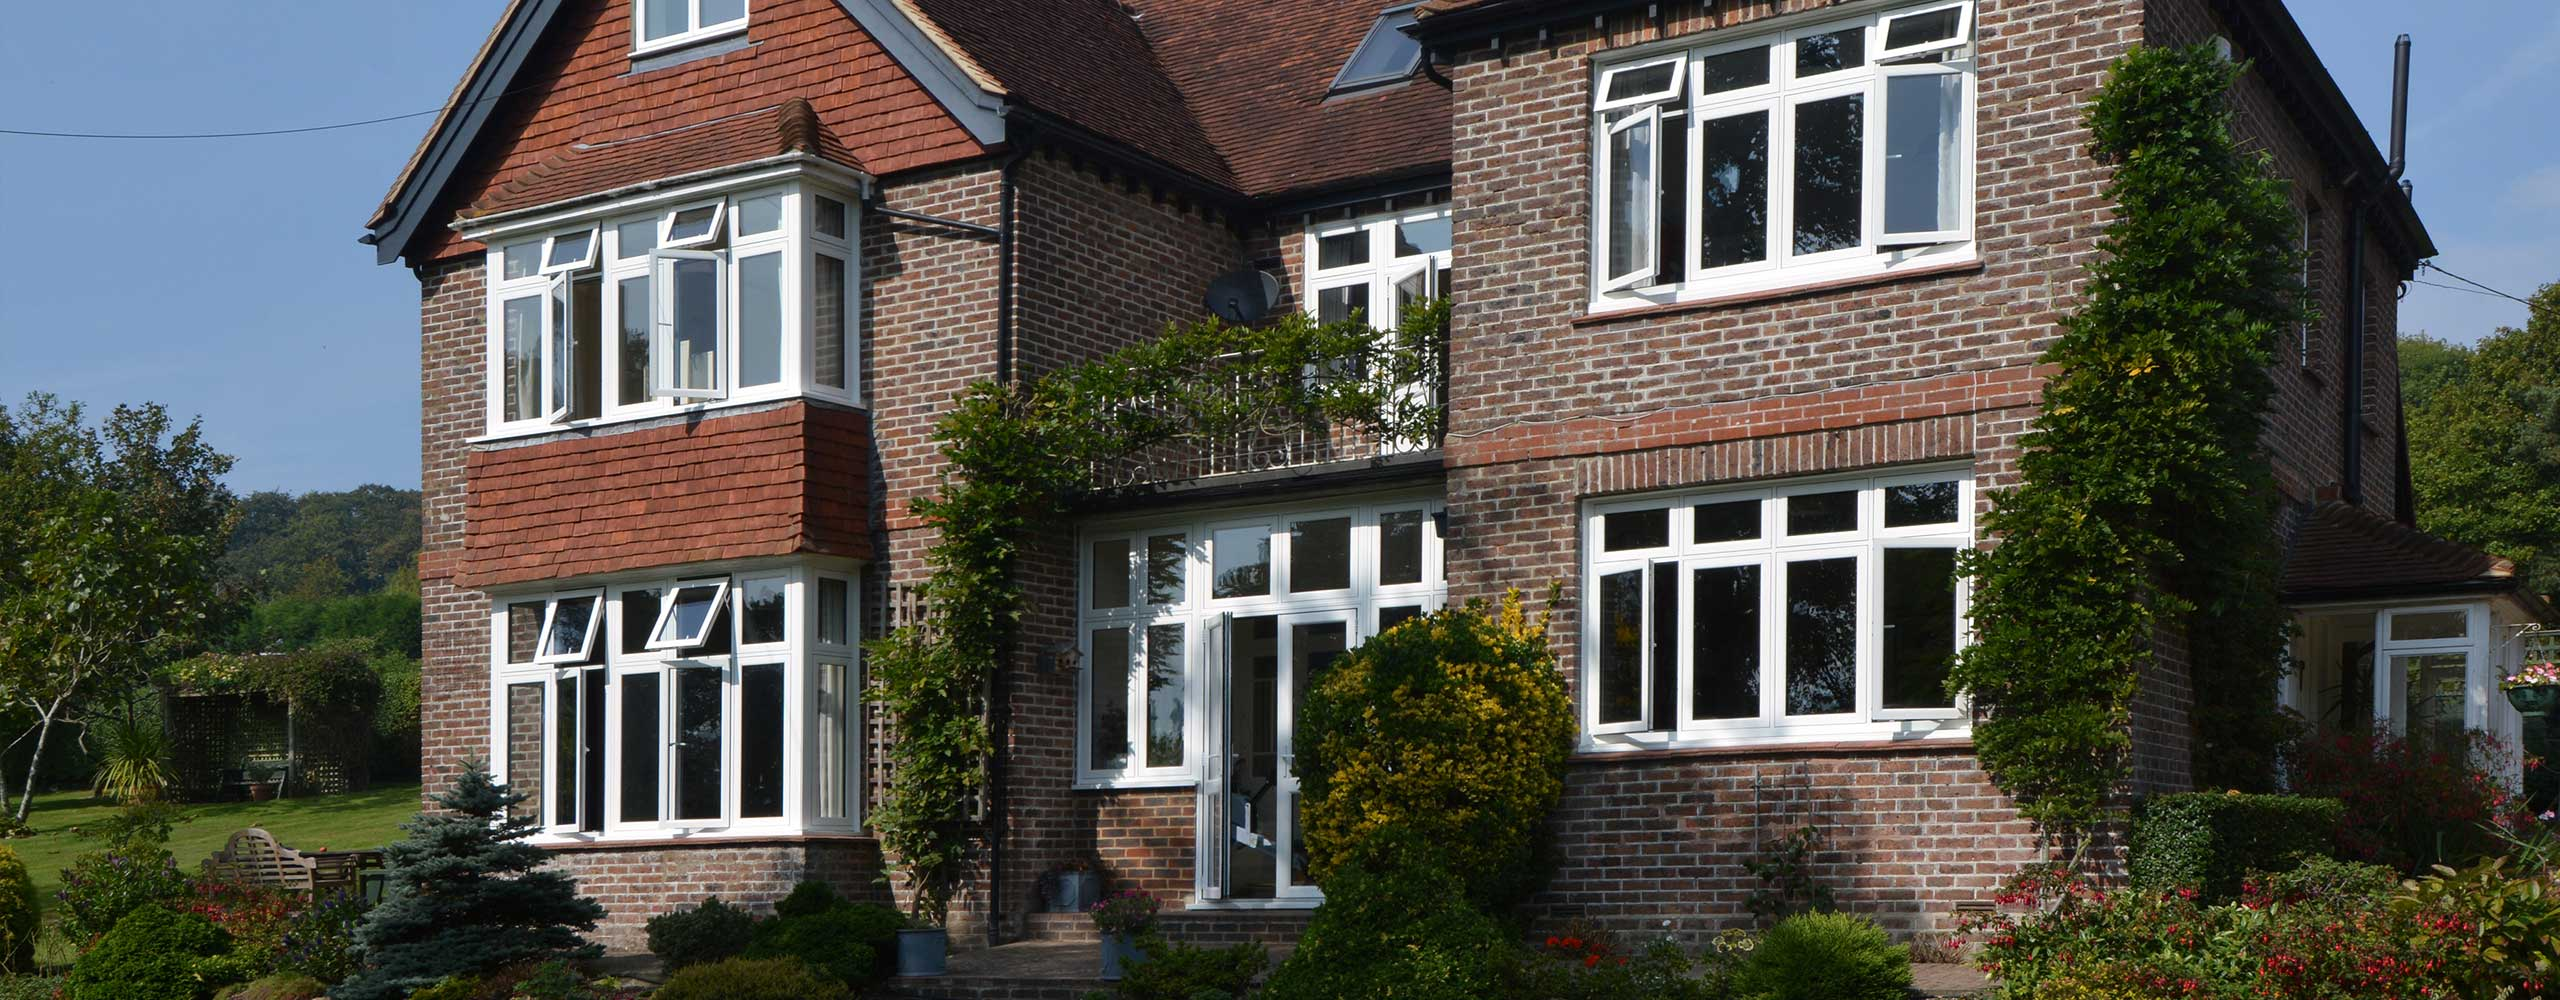 Double Glazing Polegate, East Sussex - Windows Xpress